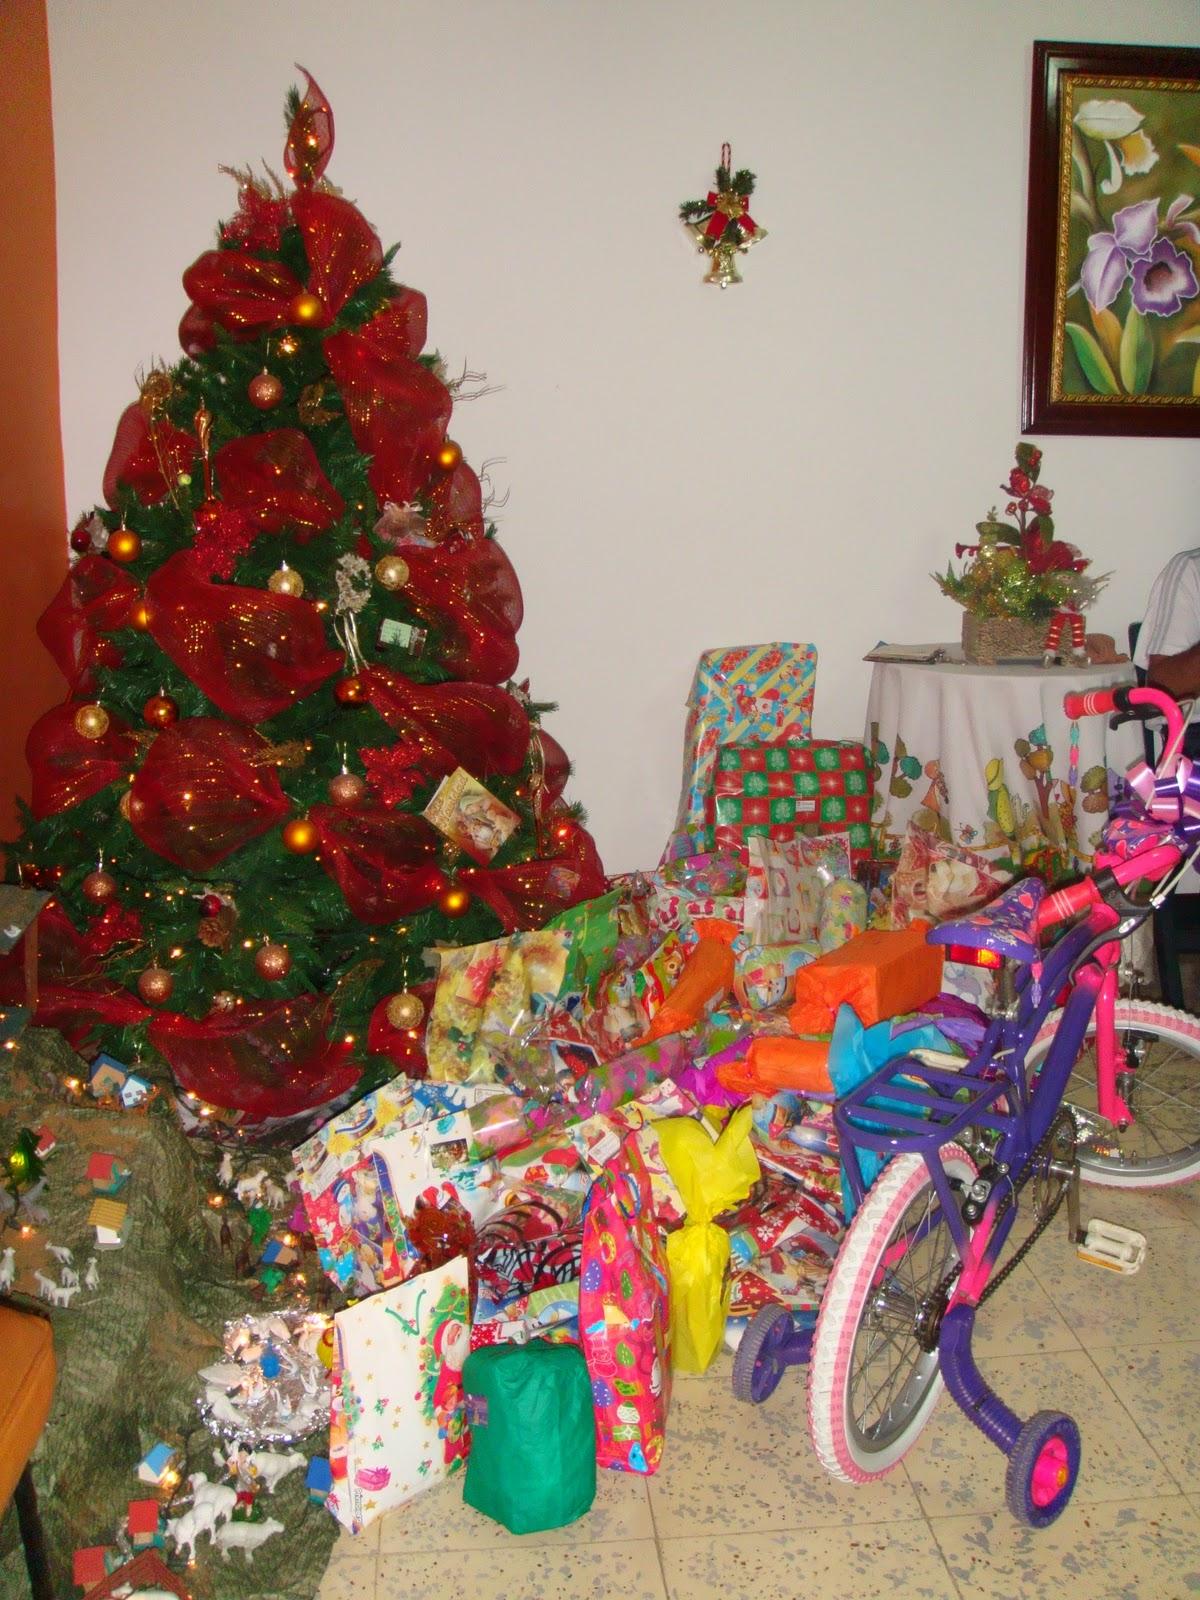 337 tage in kolumbien weihnachten la feria de cali und. Black Bedroom Furniture Sets. Home Design Ideas